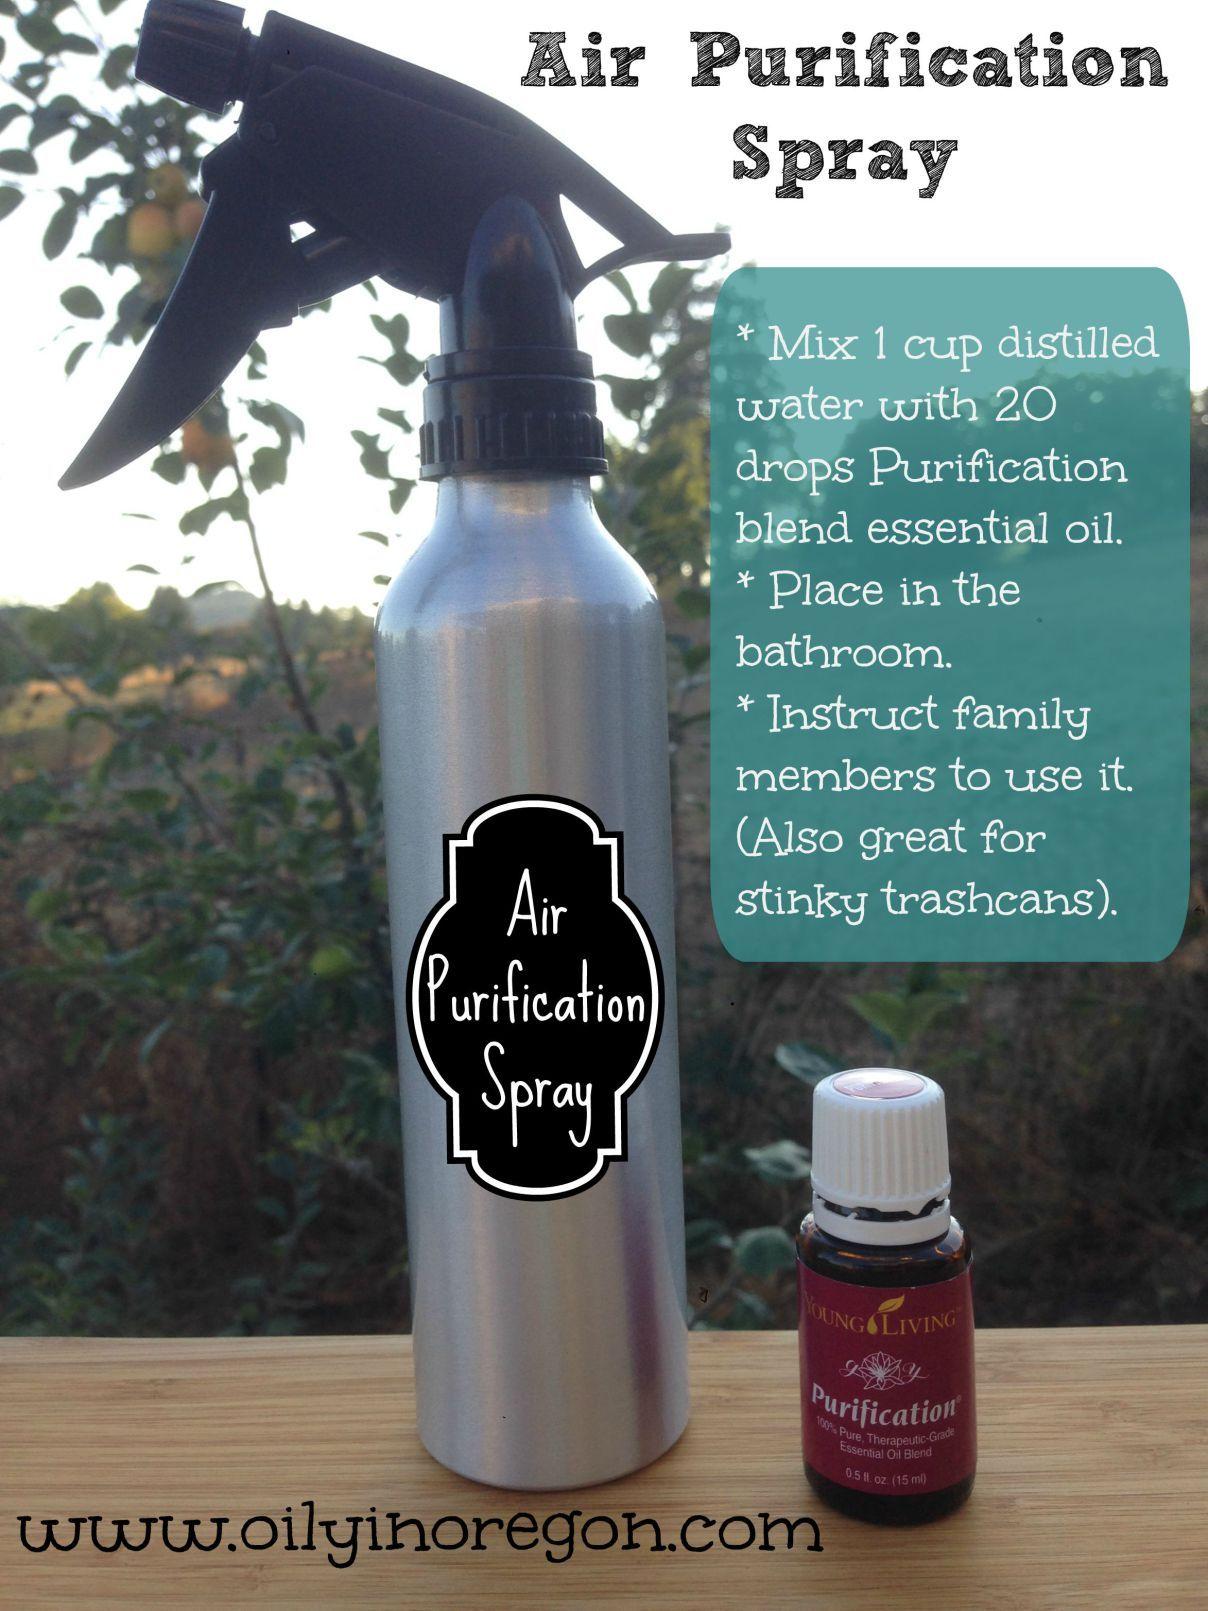 Air Purification Spray recipe Purification spray